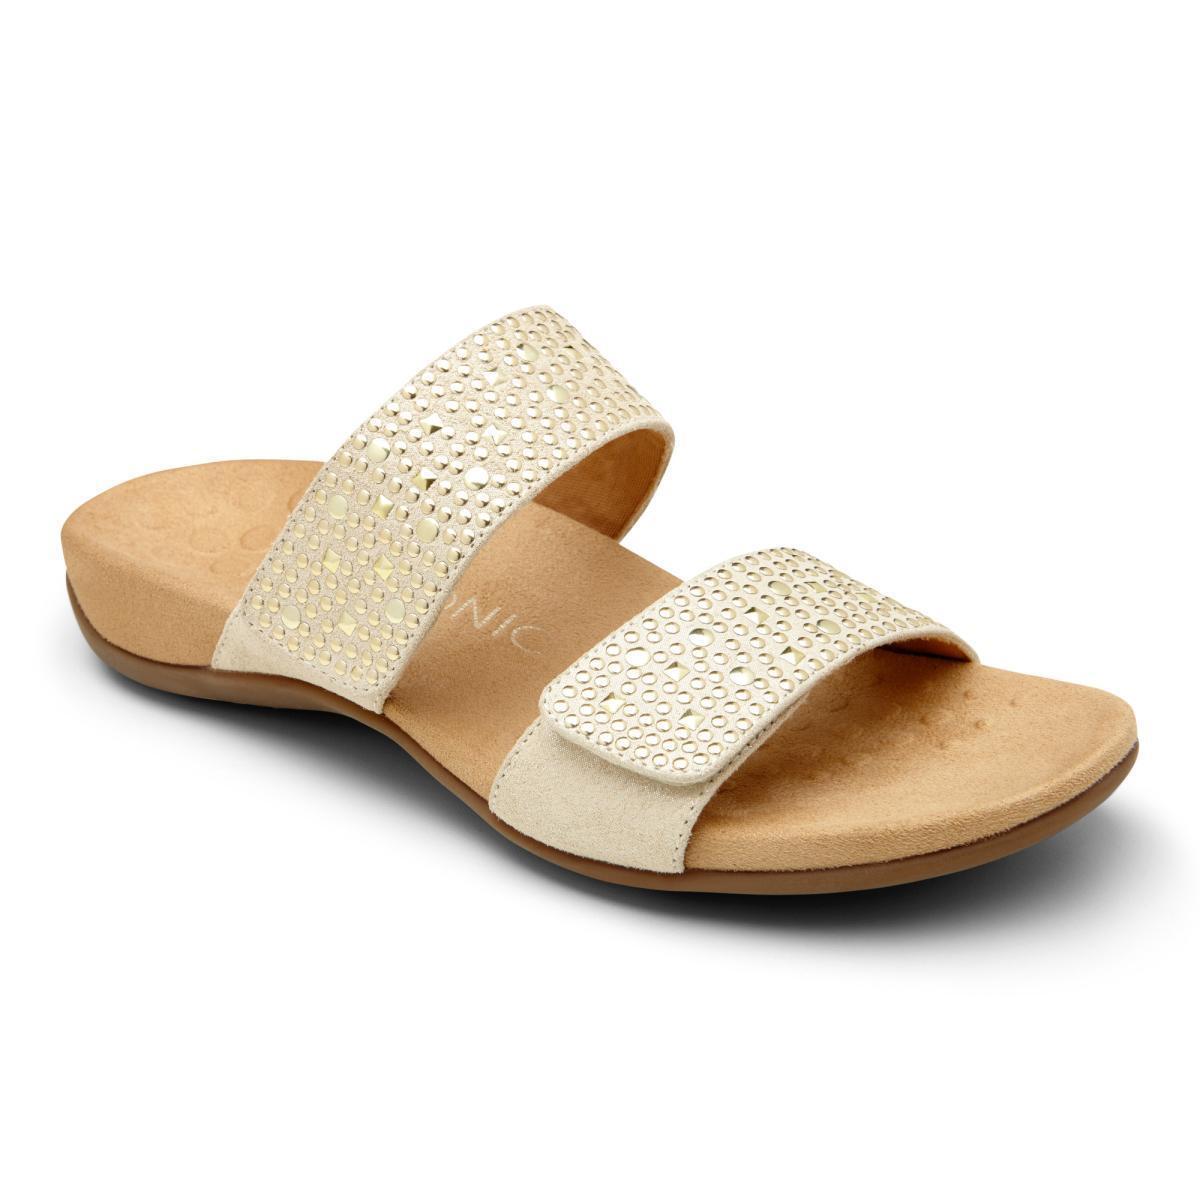 Vionic Samoa Gold Slip Sandalen Damen Größe 5-11   Neu